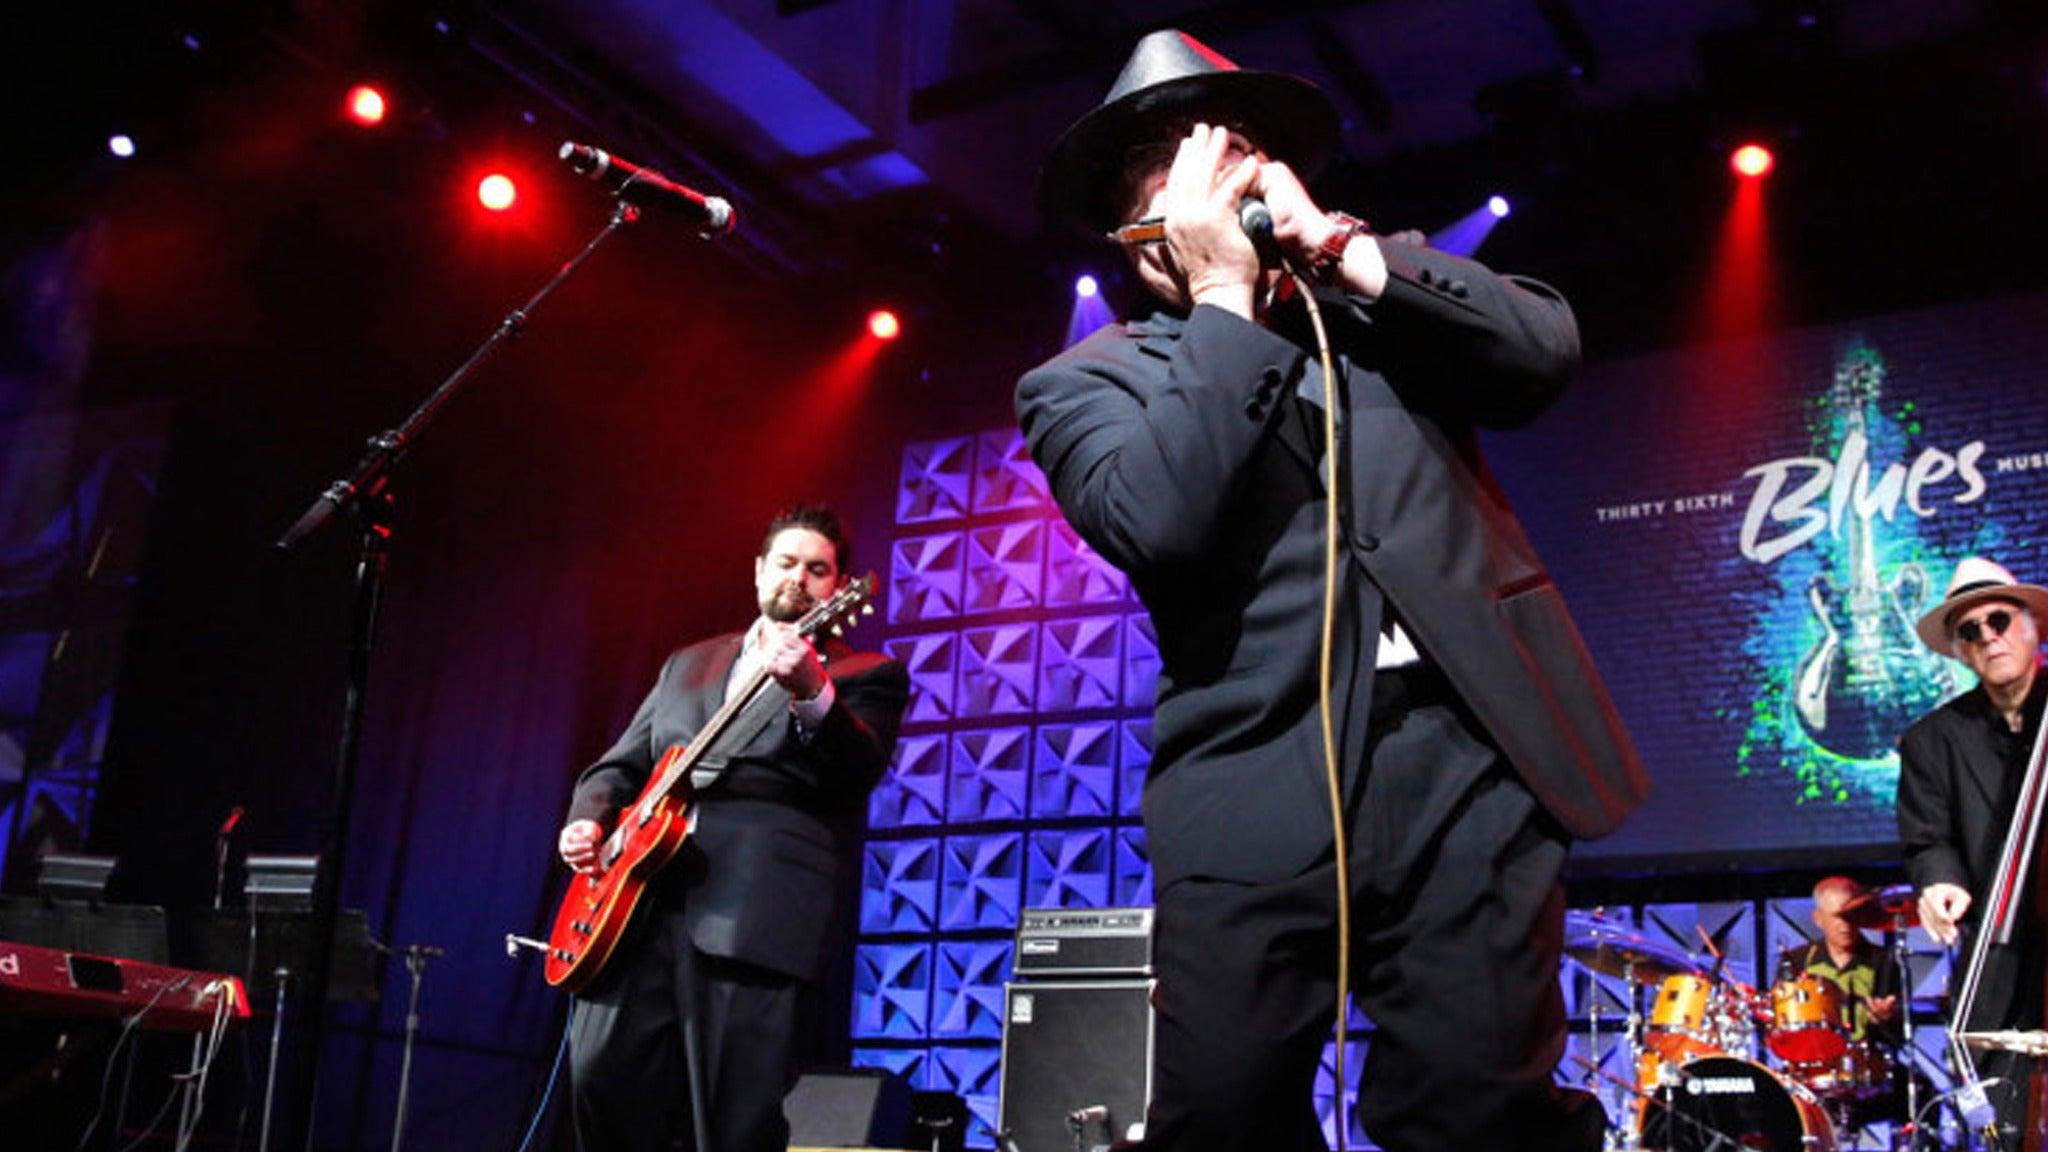 10th Annual New England Blues Festival